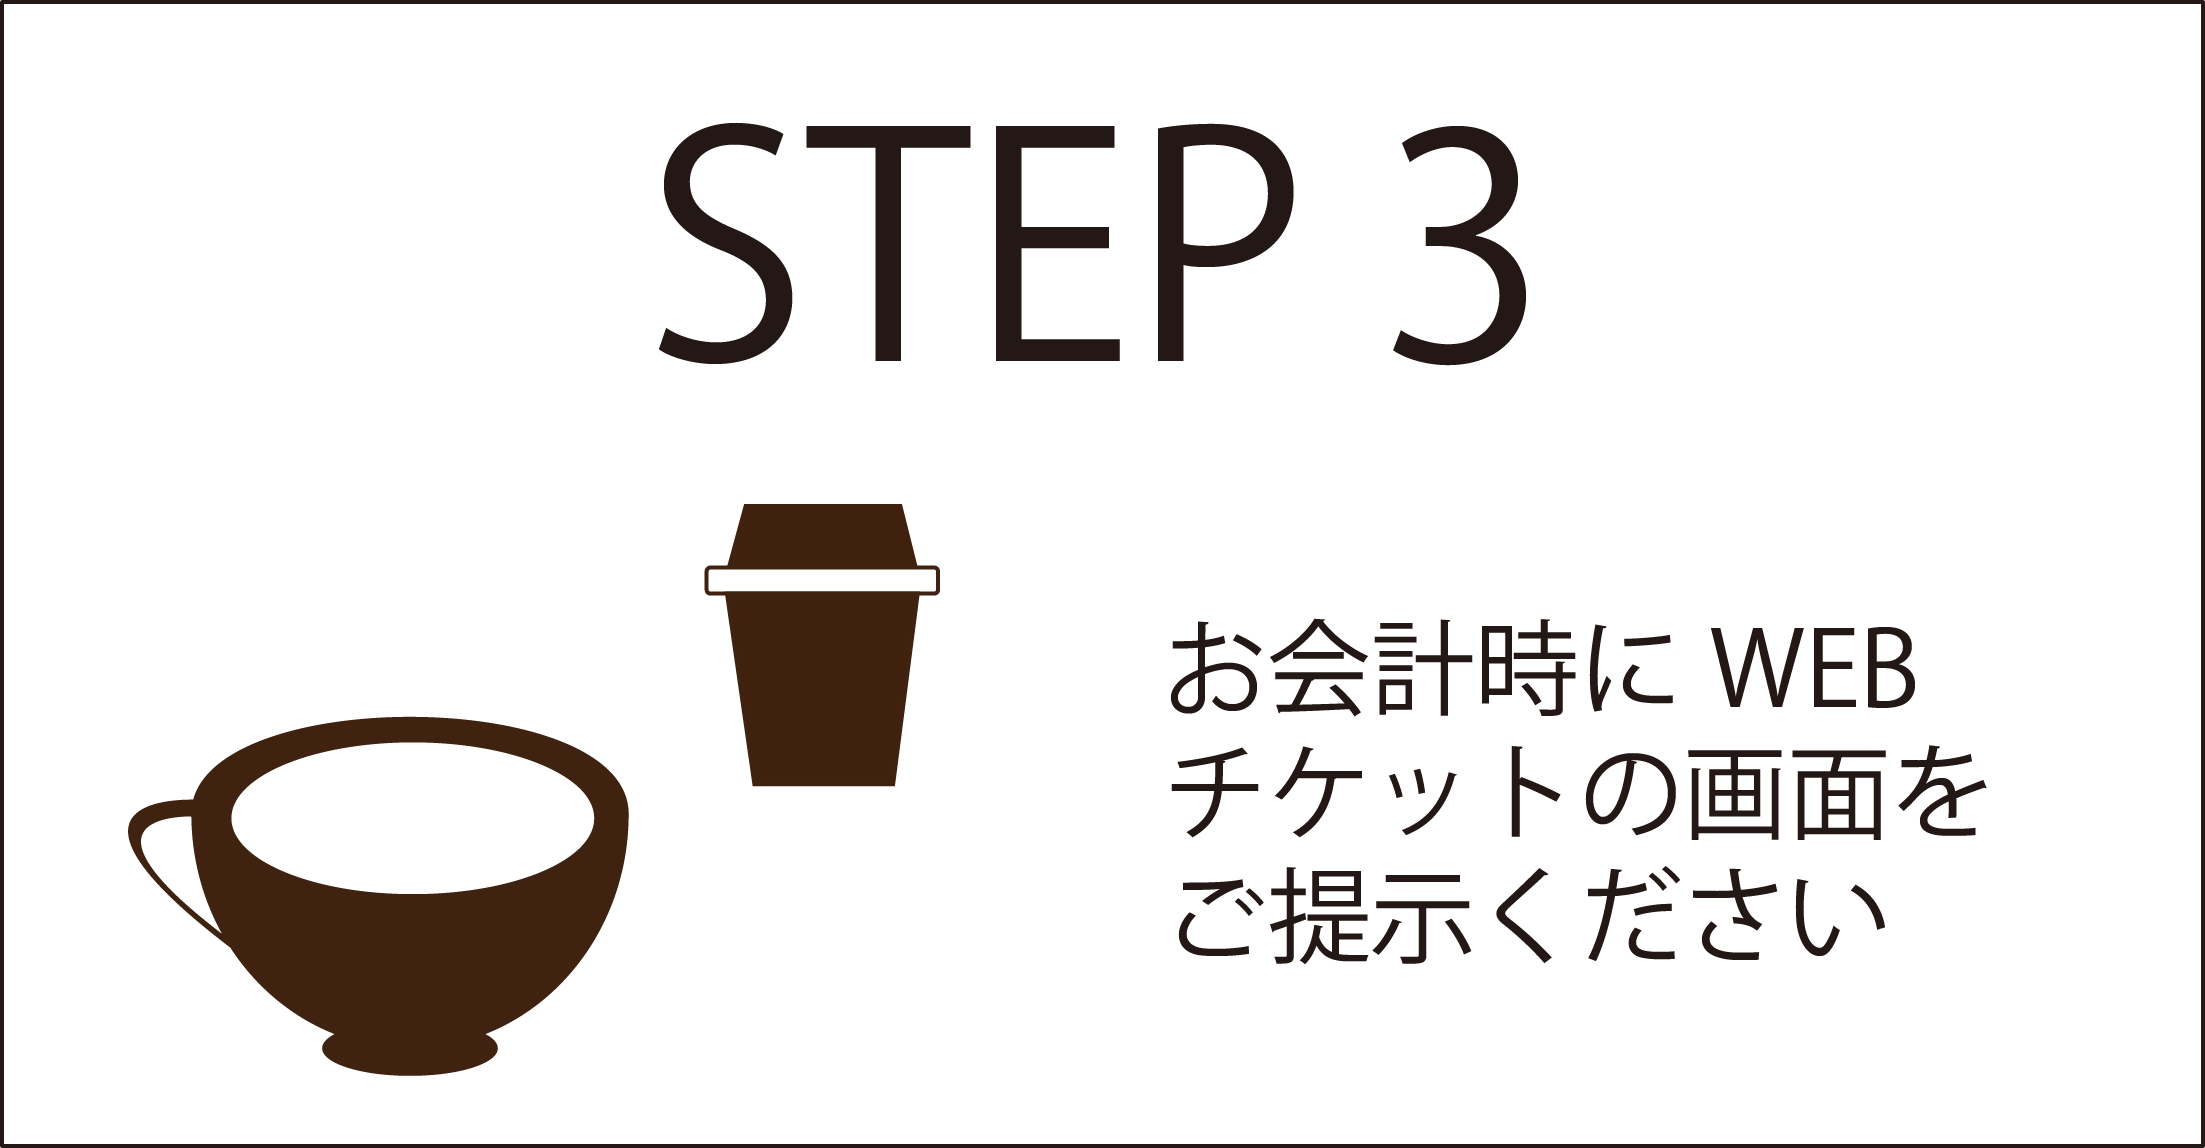 STEP 2 TAMa-GOのサイトから、京王プラザホテルを選択して頂き、ご希望のチケットをご購入ください